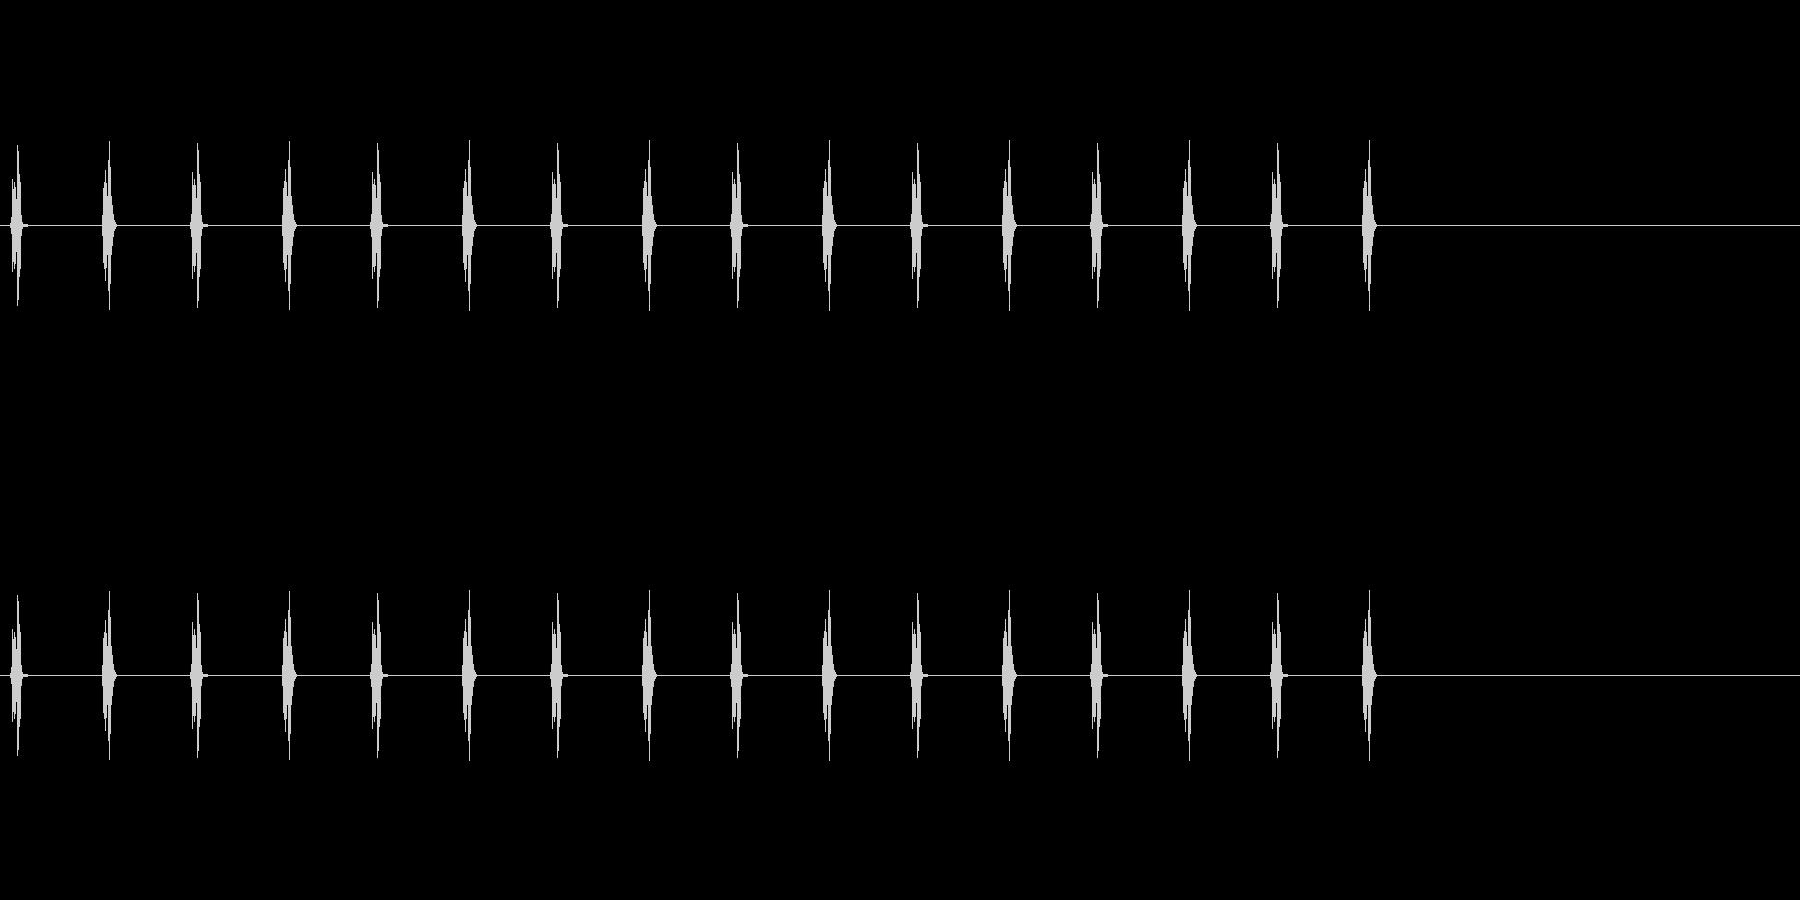 BPM120の4分間隔で鳴る時計の針の音の未再生の波形